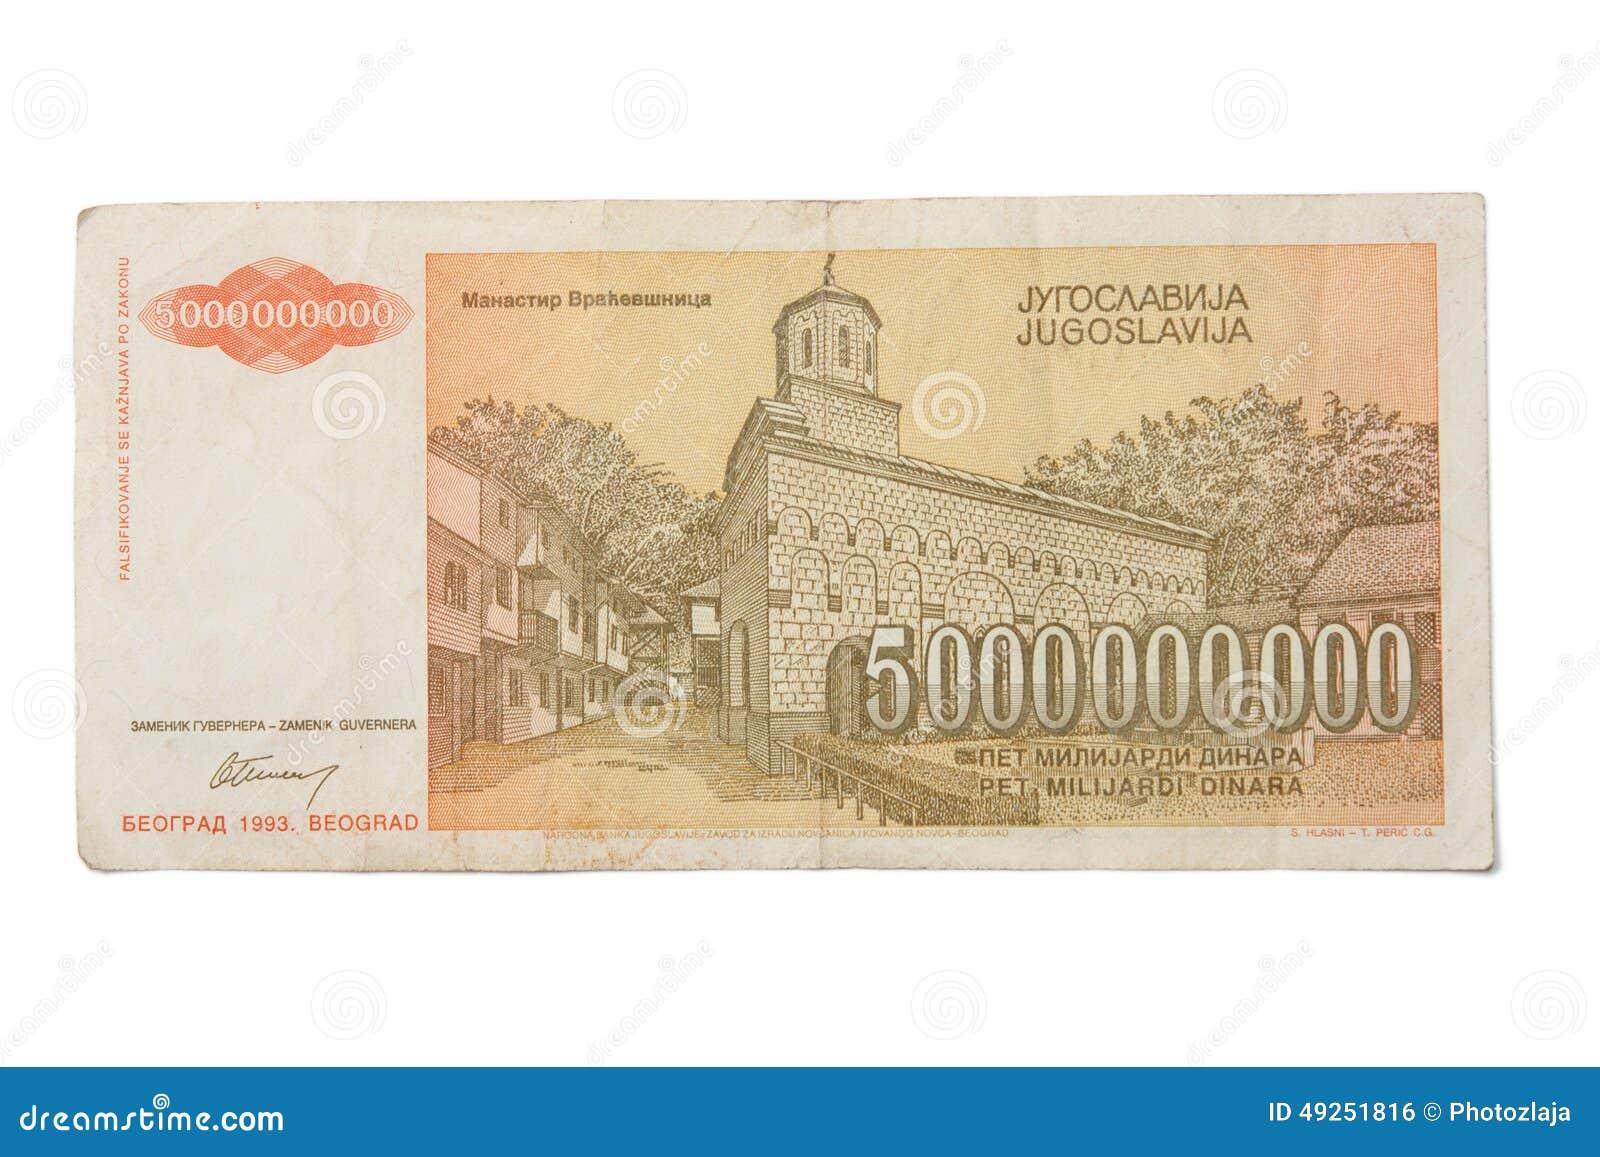 Bankbiljet van 5 miljard dinars van Joegoslavië